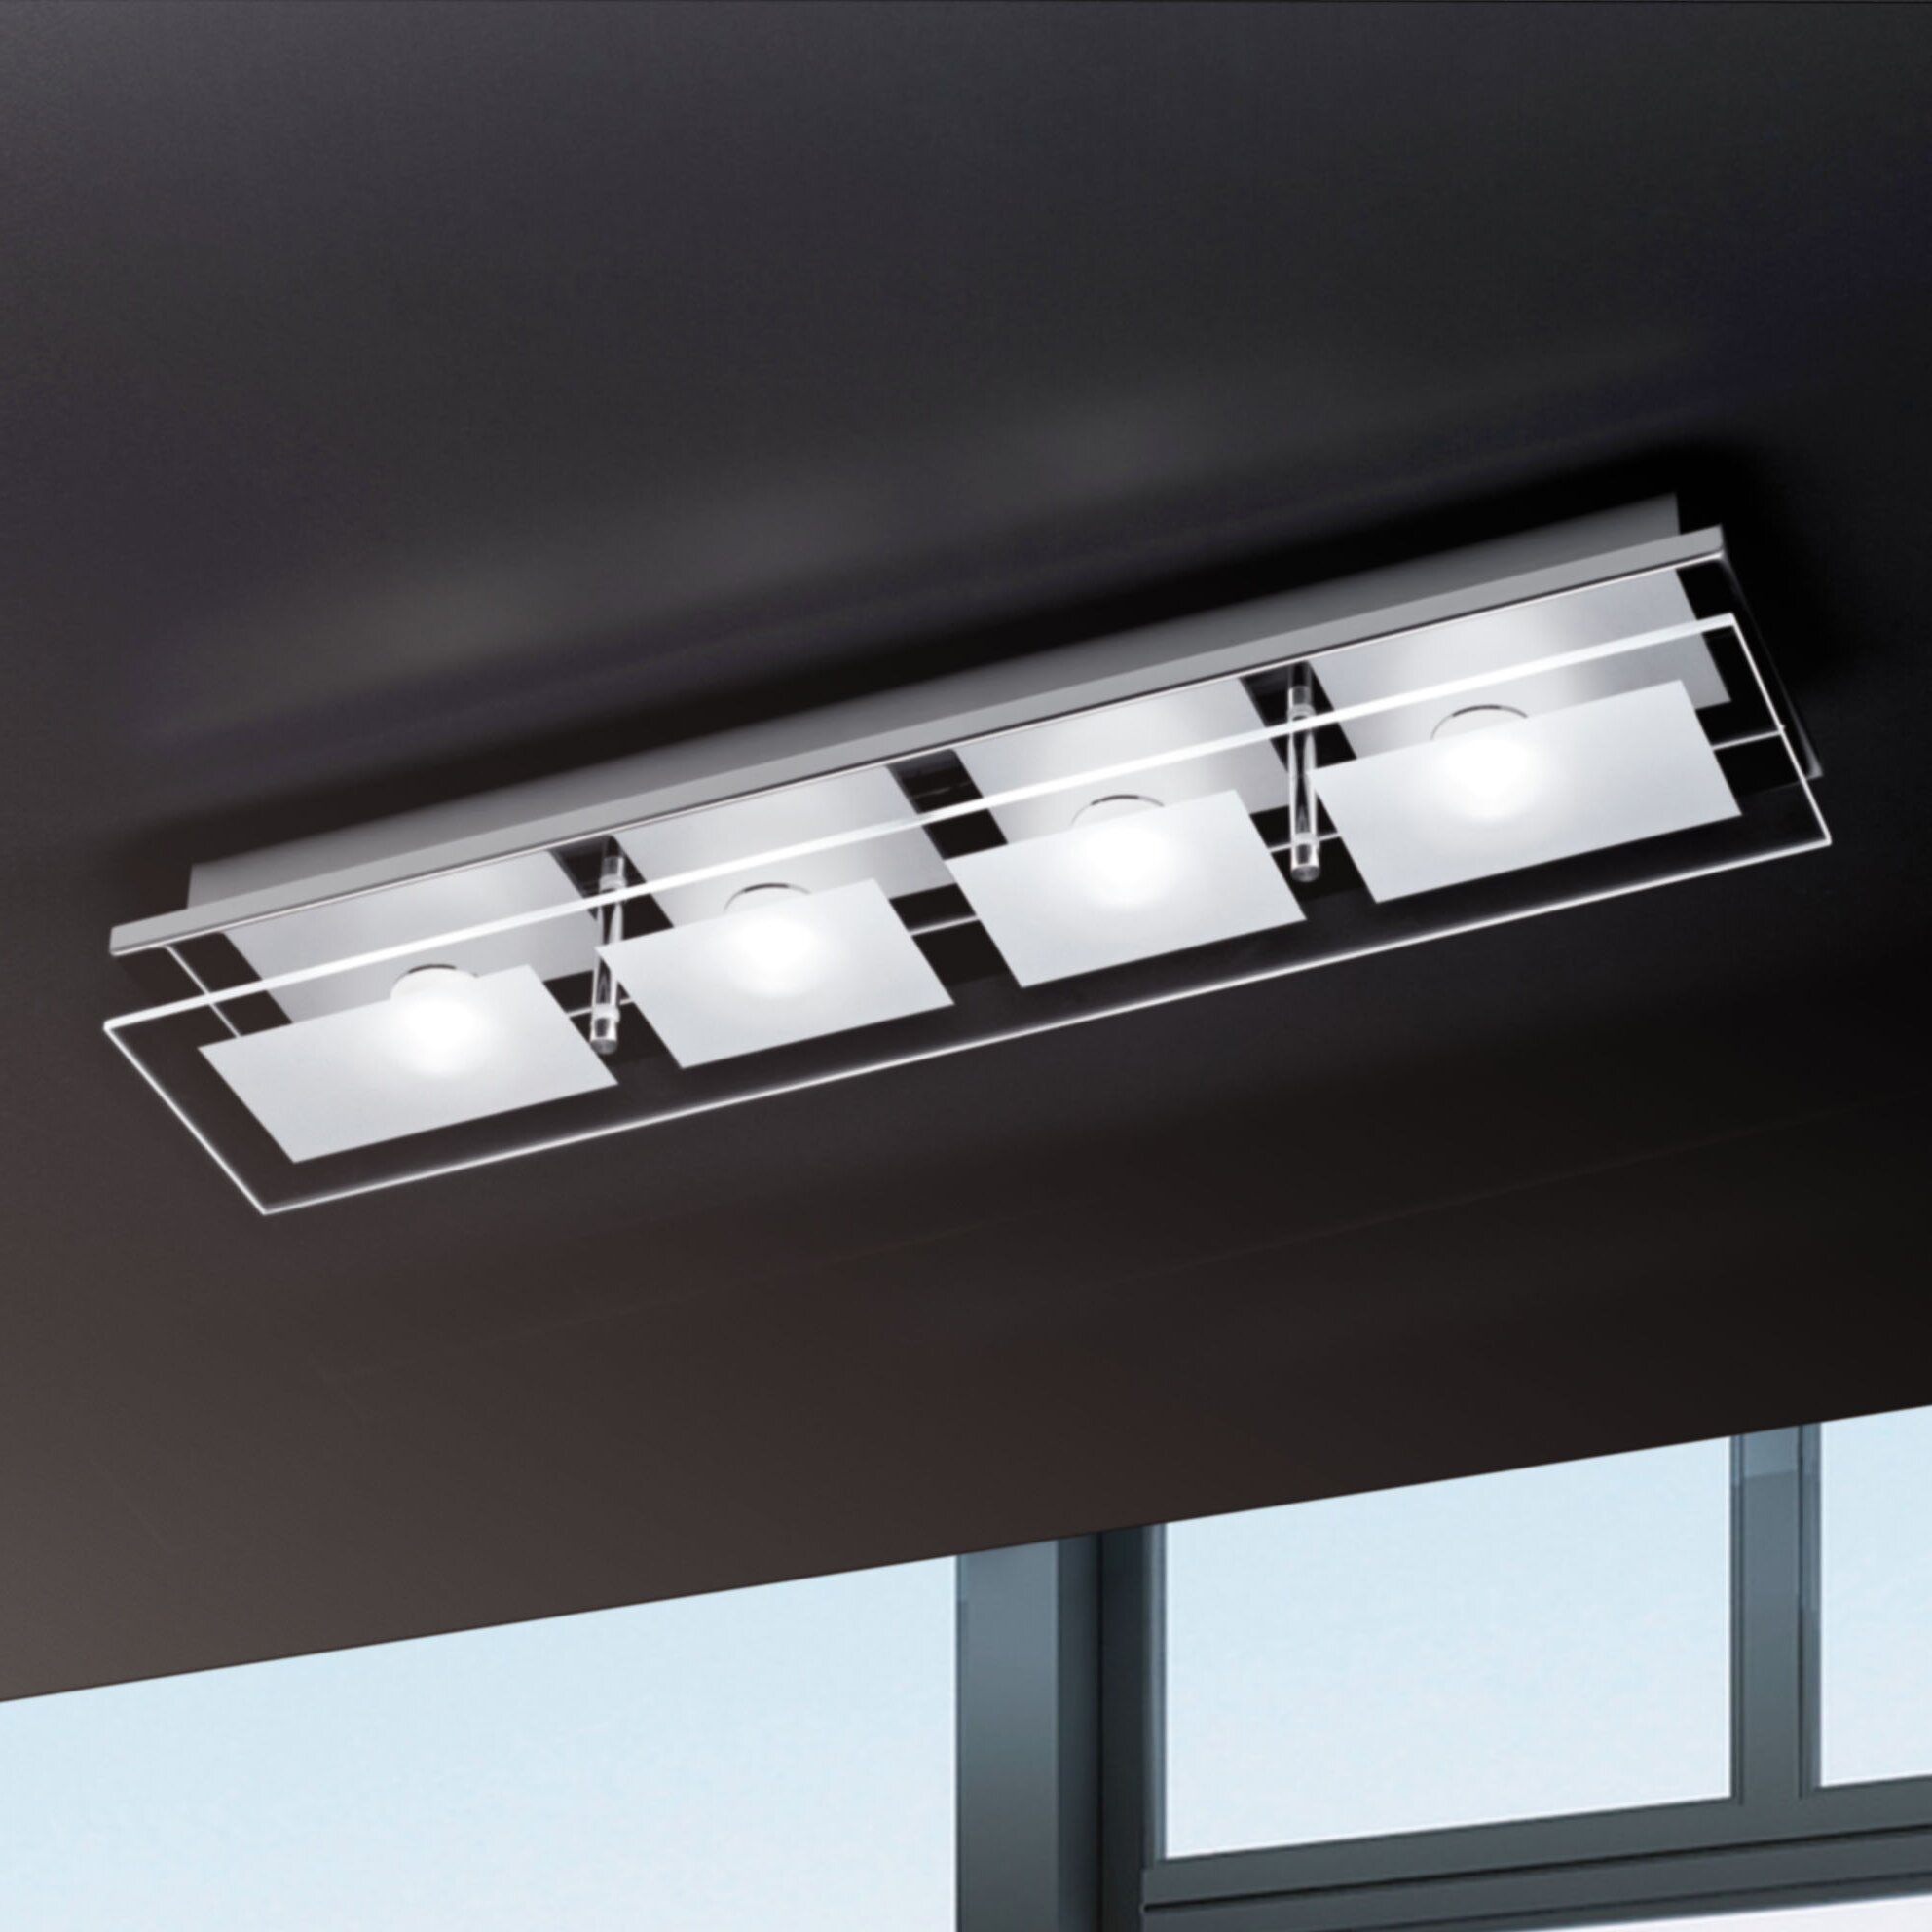 paul neuhaus chiron 4 light flush semi flush mount reviews wayfair uk. Black Bedroom Furniture Sets. Home Design Ideas